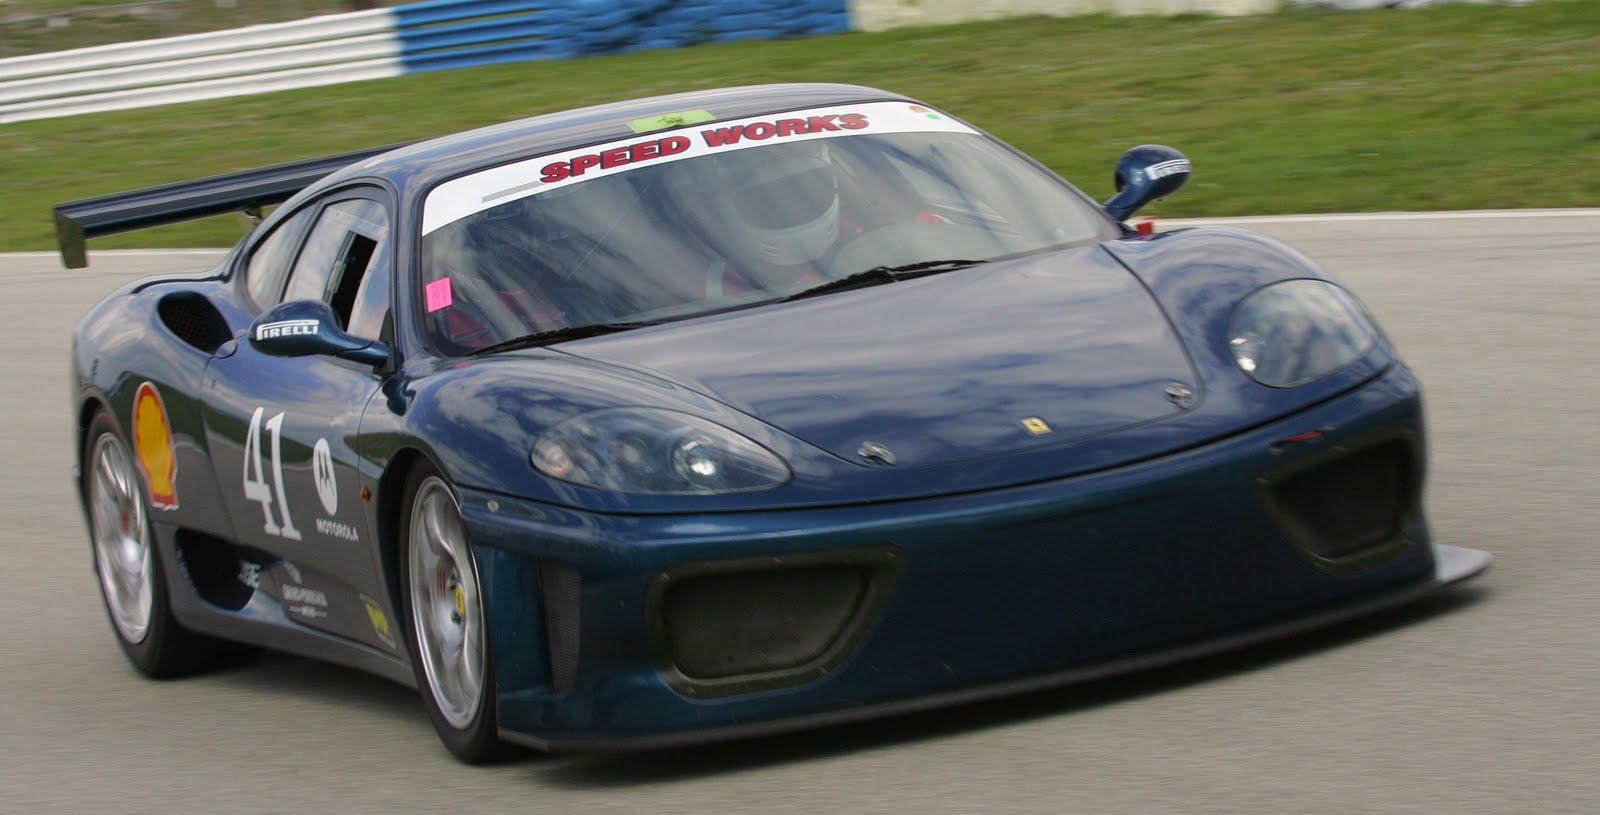 his 360 Ferrari Challenge